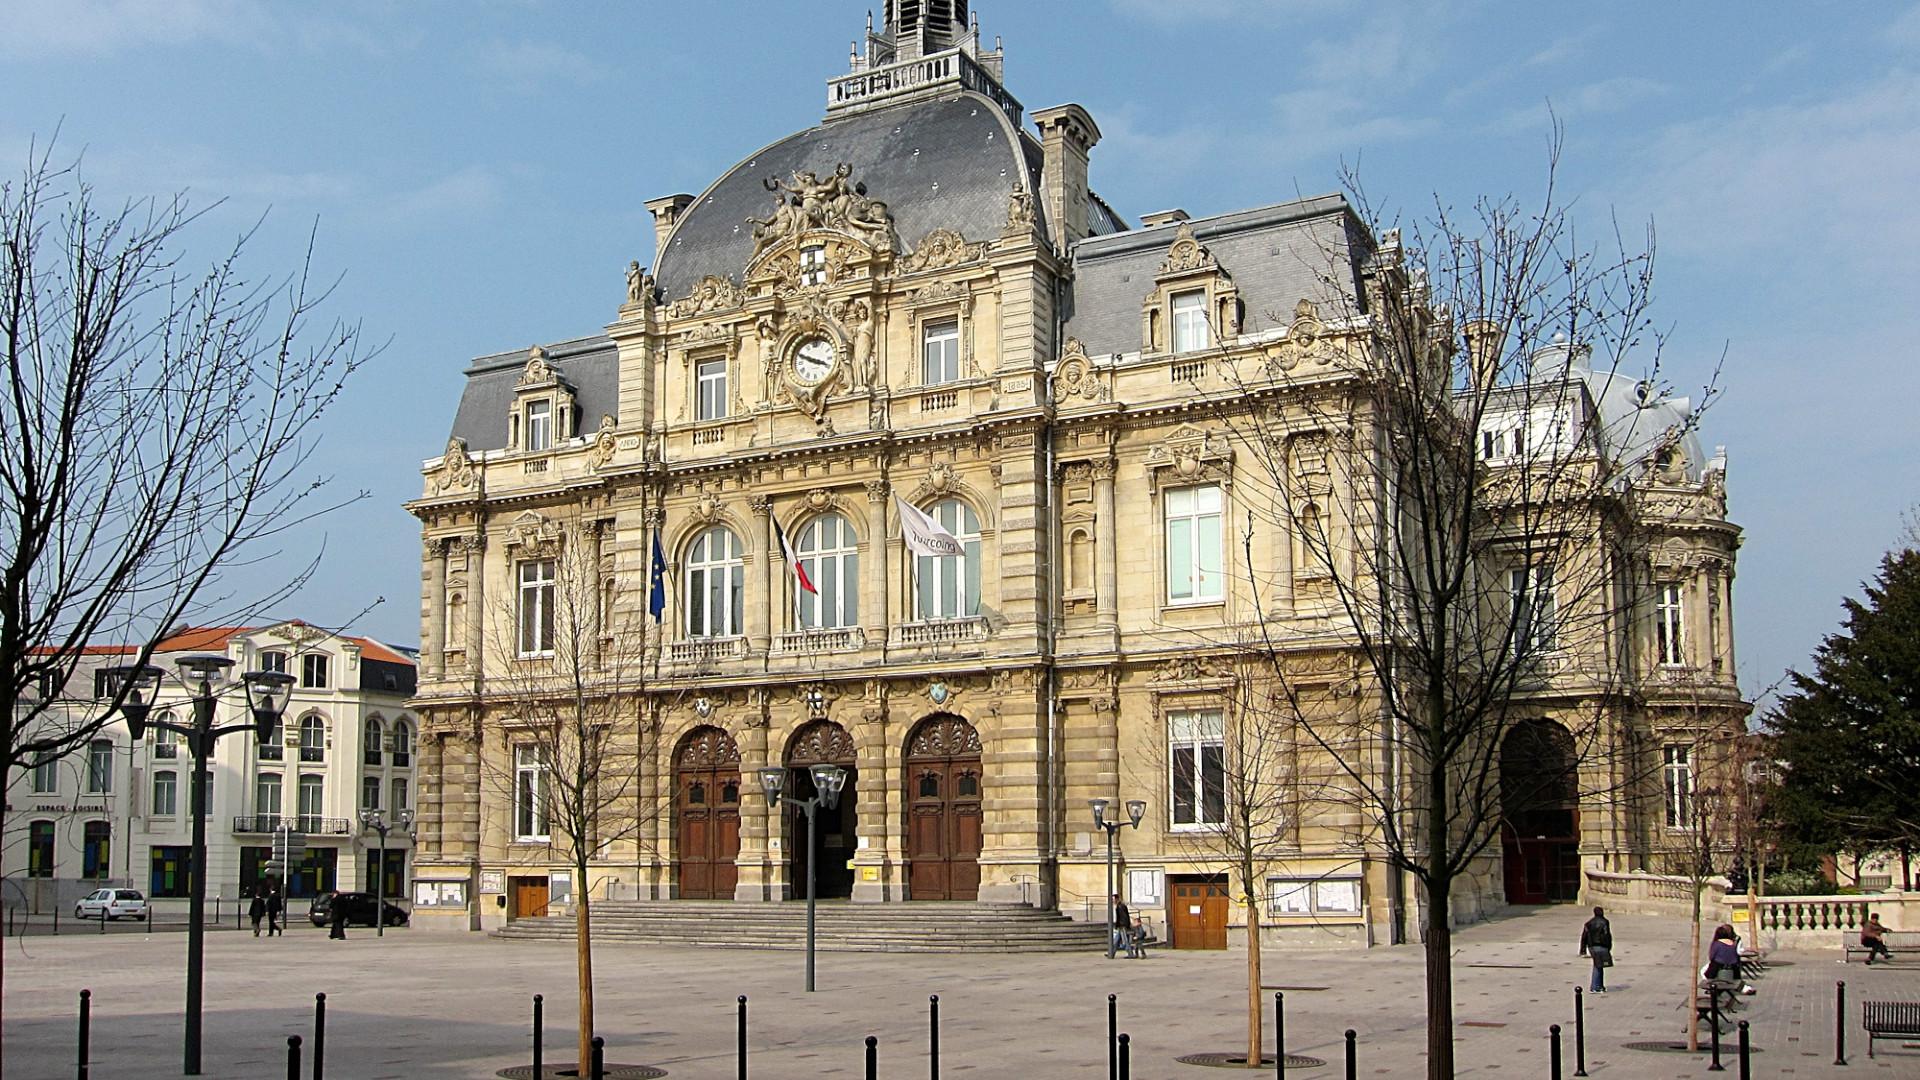 Tourcoing